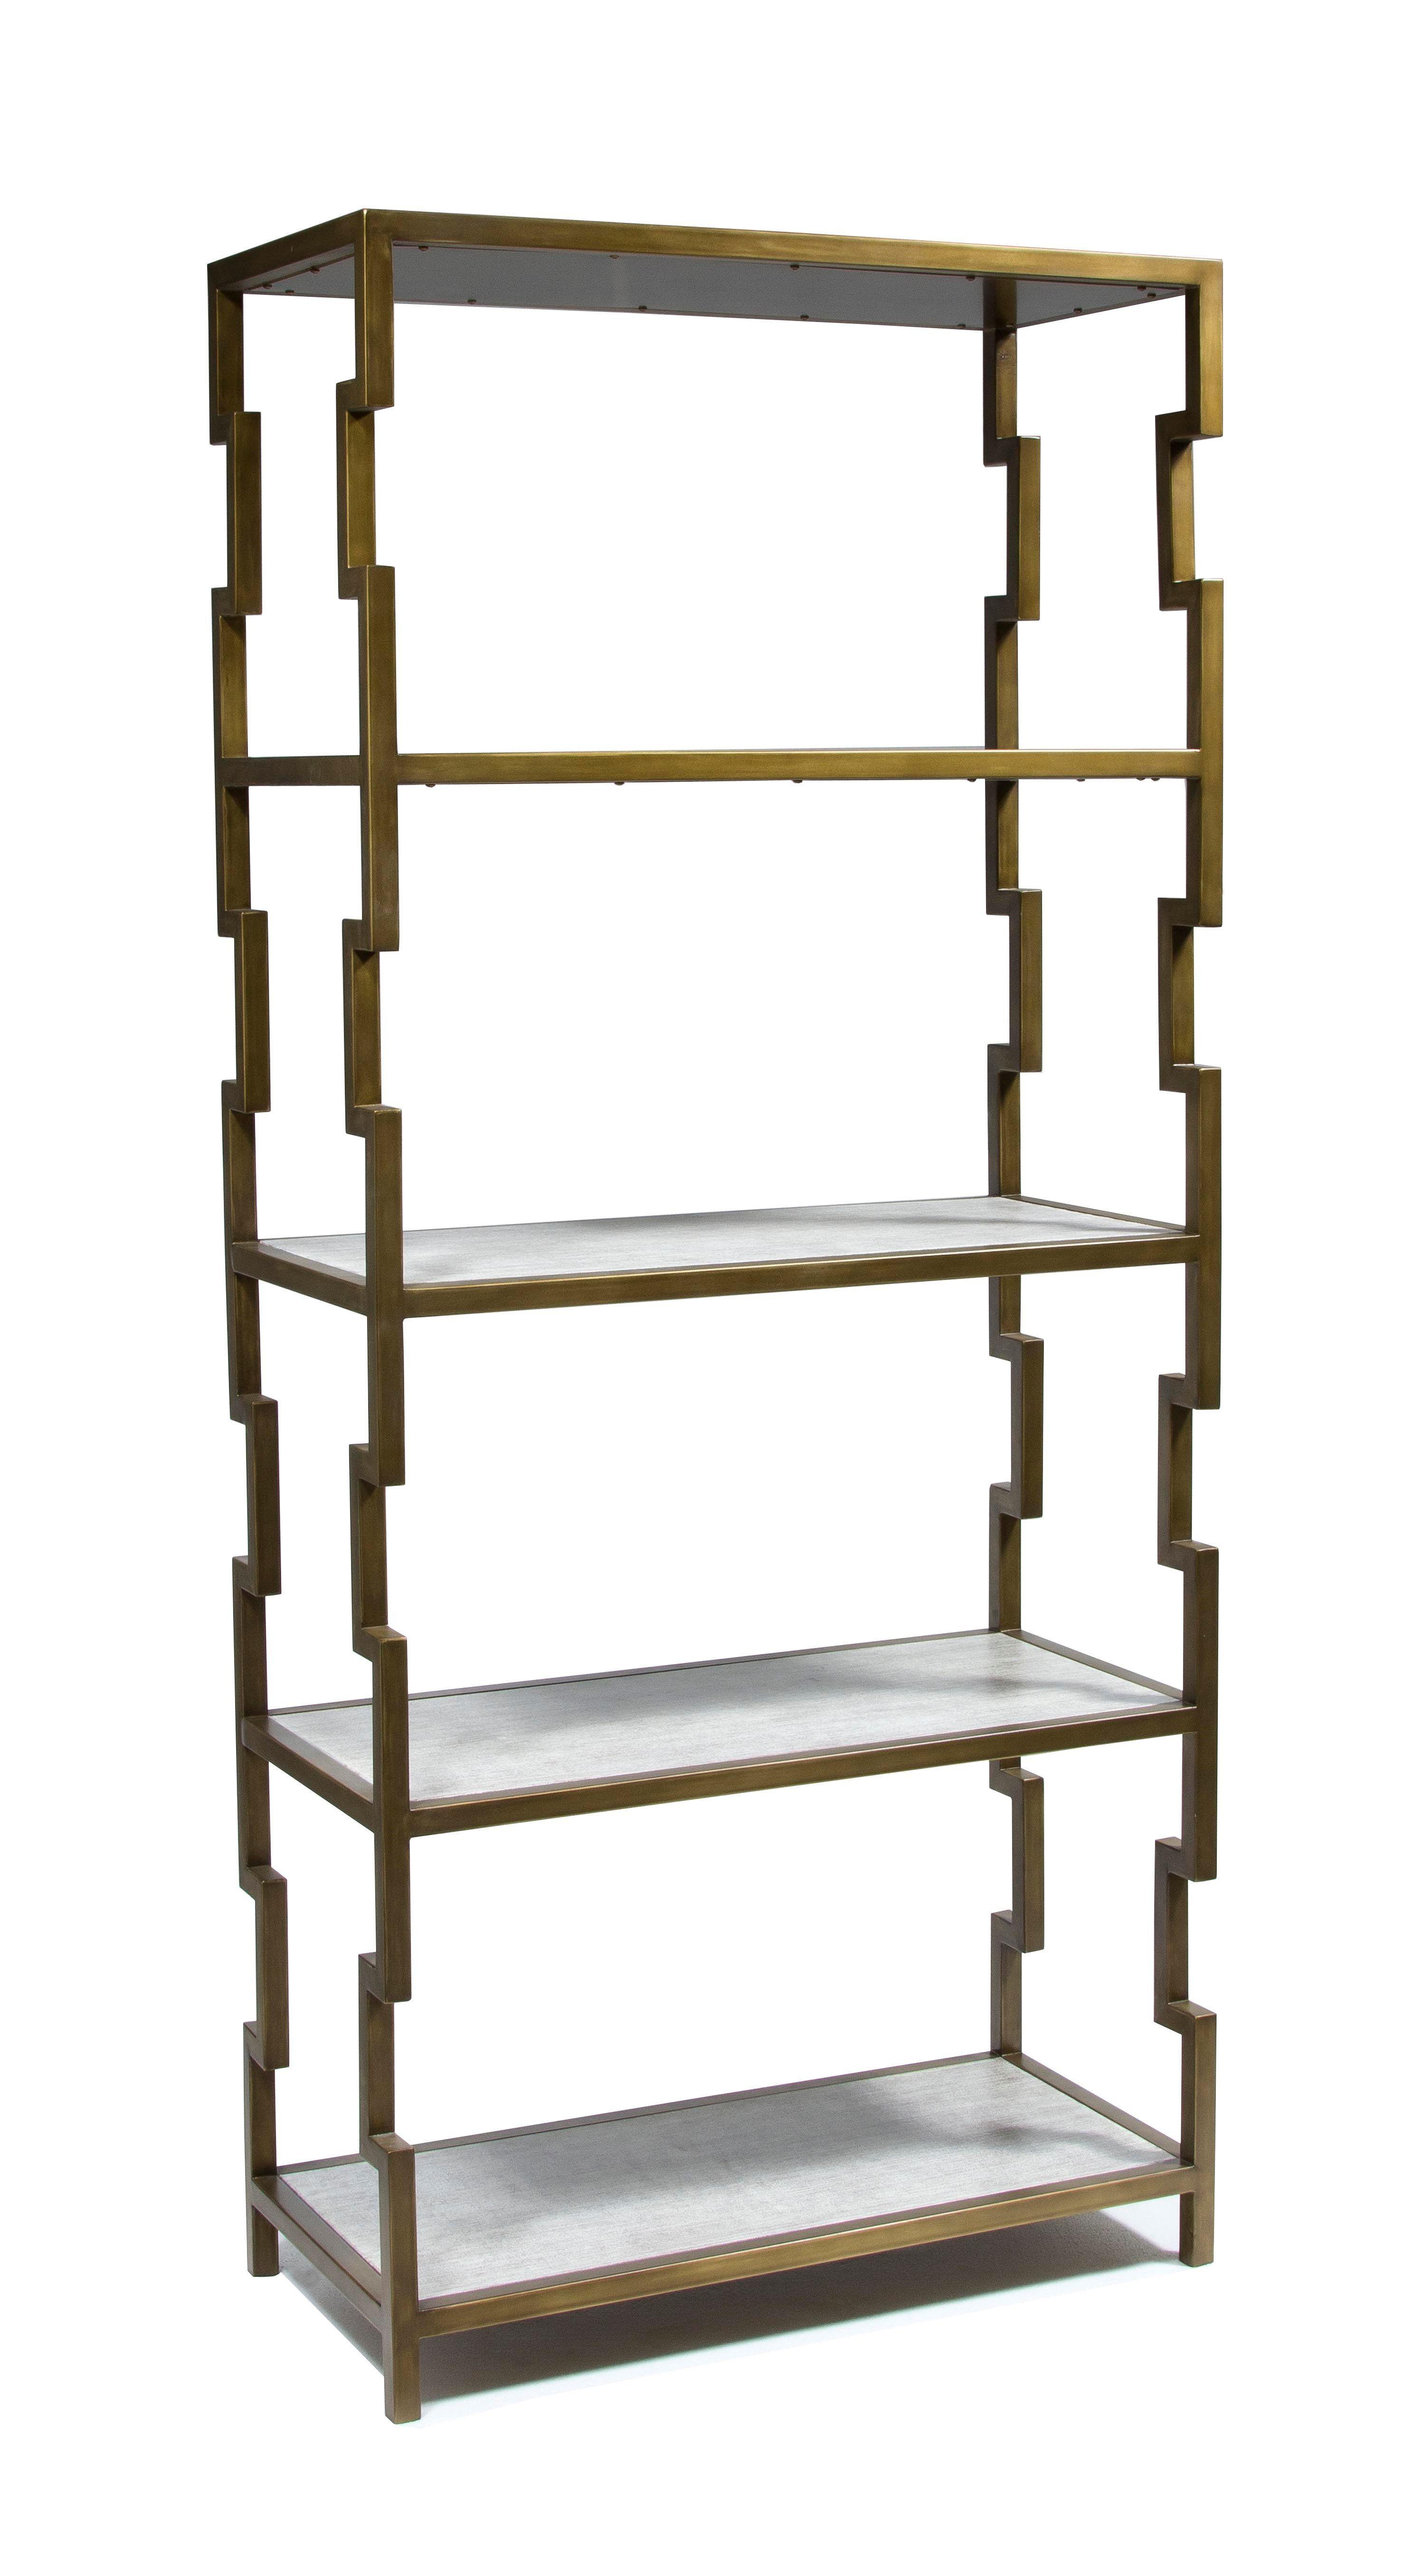 Fontana 5 Tiered Bookshelf